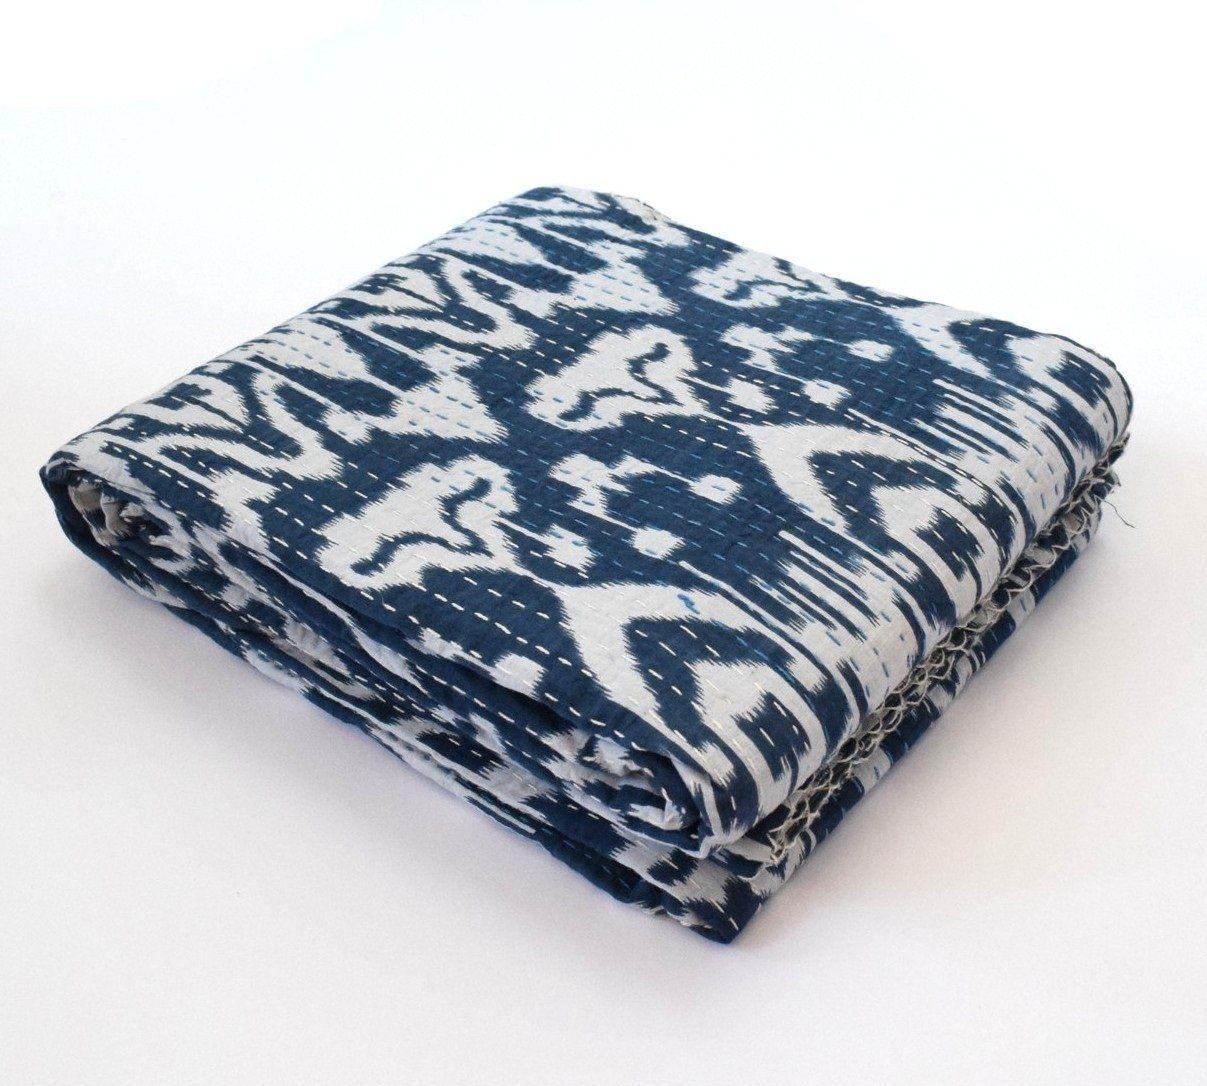 Indian Handmade Blue Kantha Quilt Bedspread Reversible Bedding Throw Queen Size